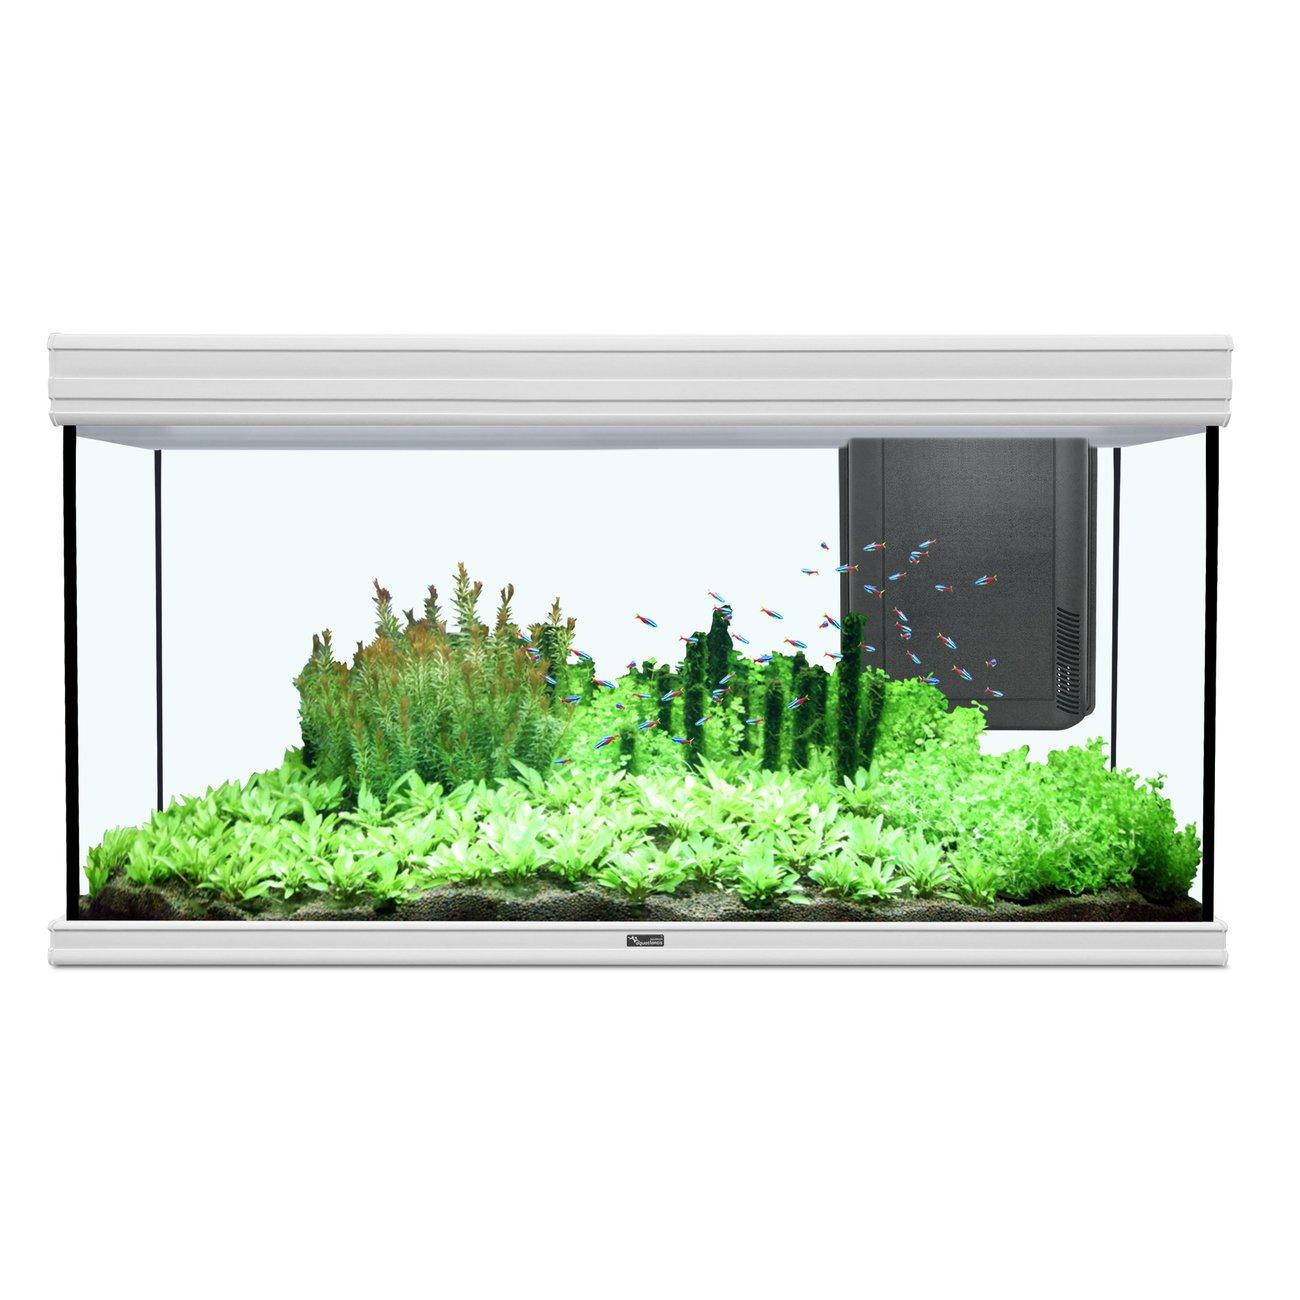 Aquatlantis Fusion 120x50cm Aquarium, 120x50x70cm, 420L/330L, braun